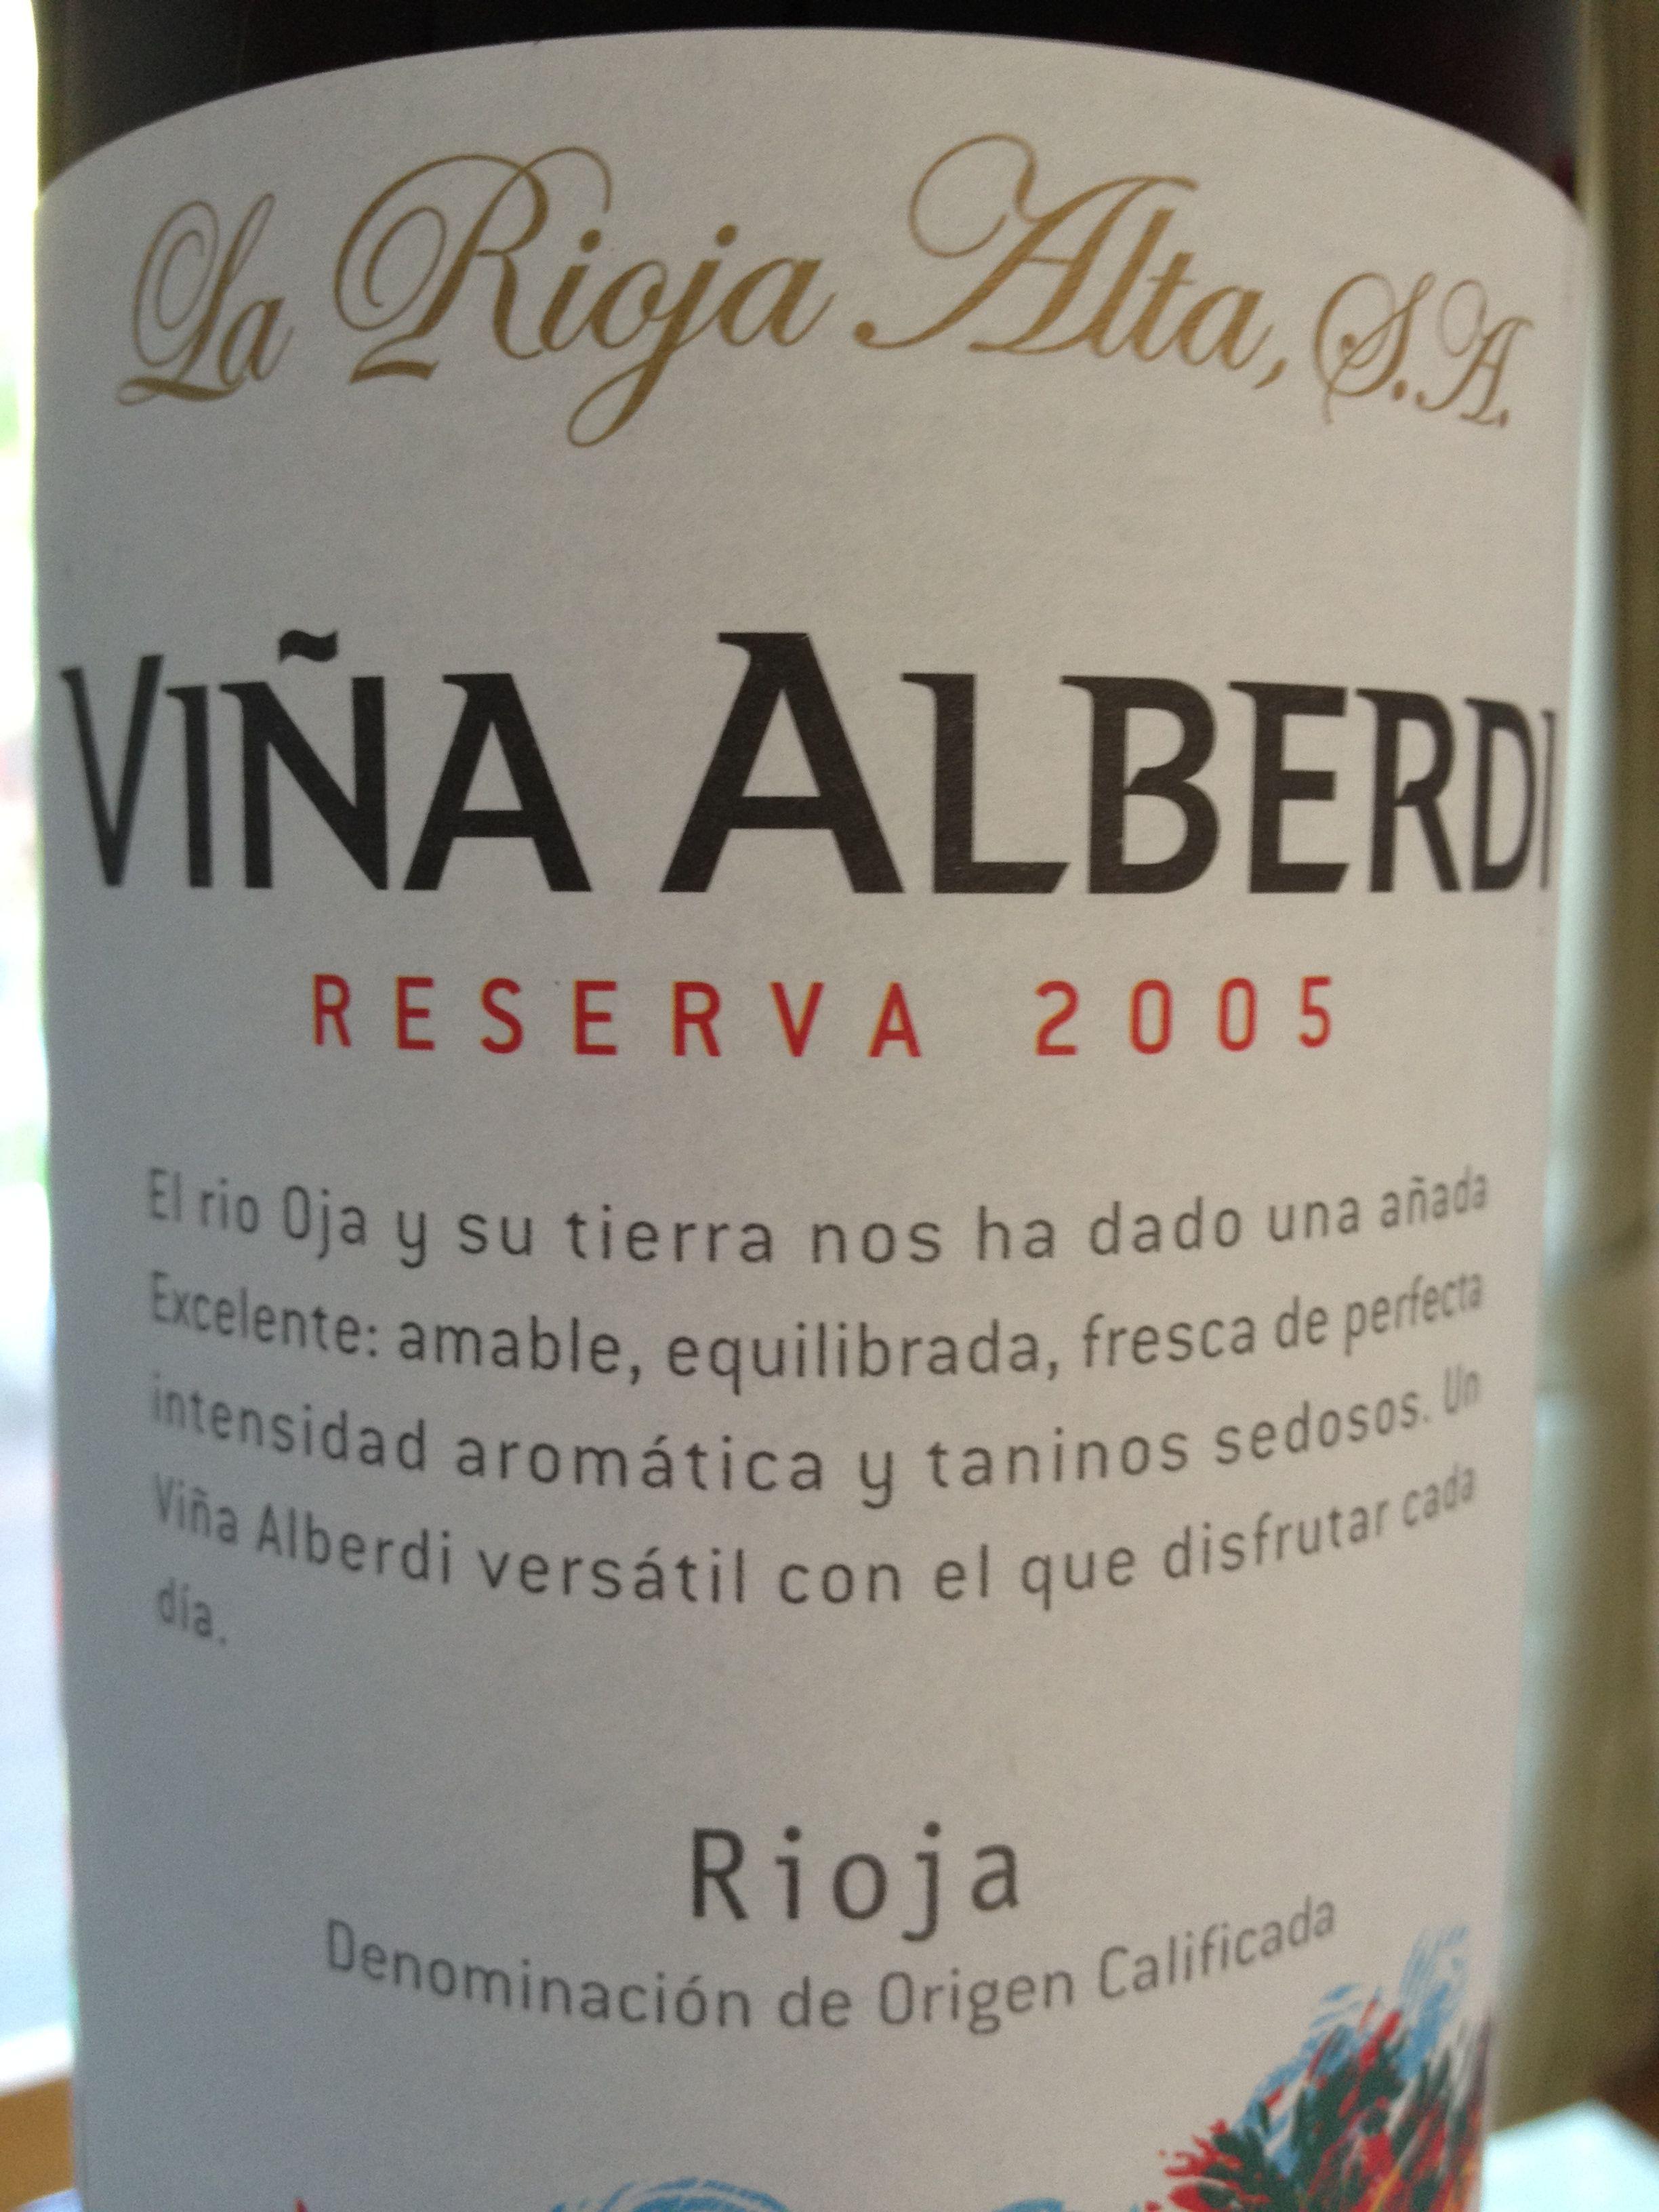 Vina Alberdi Reserva 2005 Vodka Bottle Wines Rioja